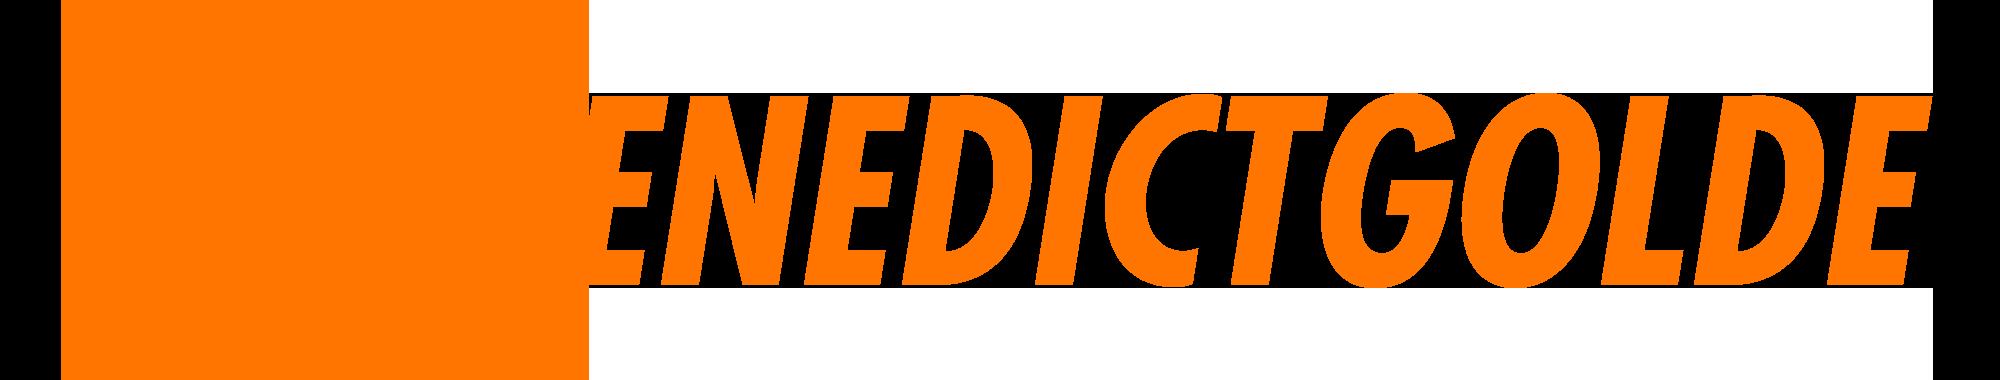 benedictgolde.com